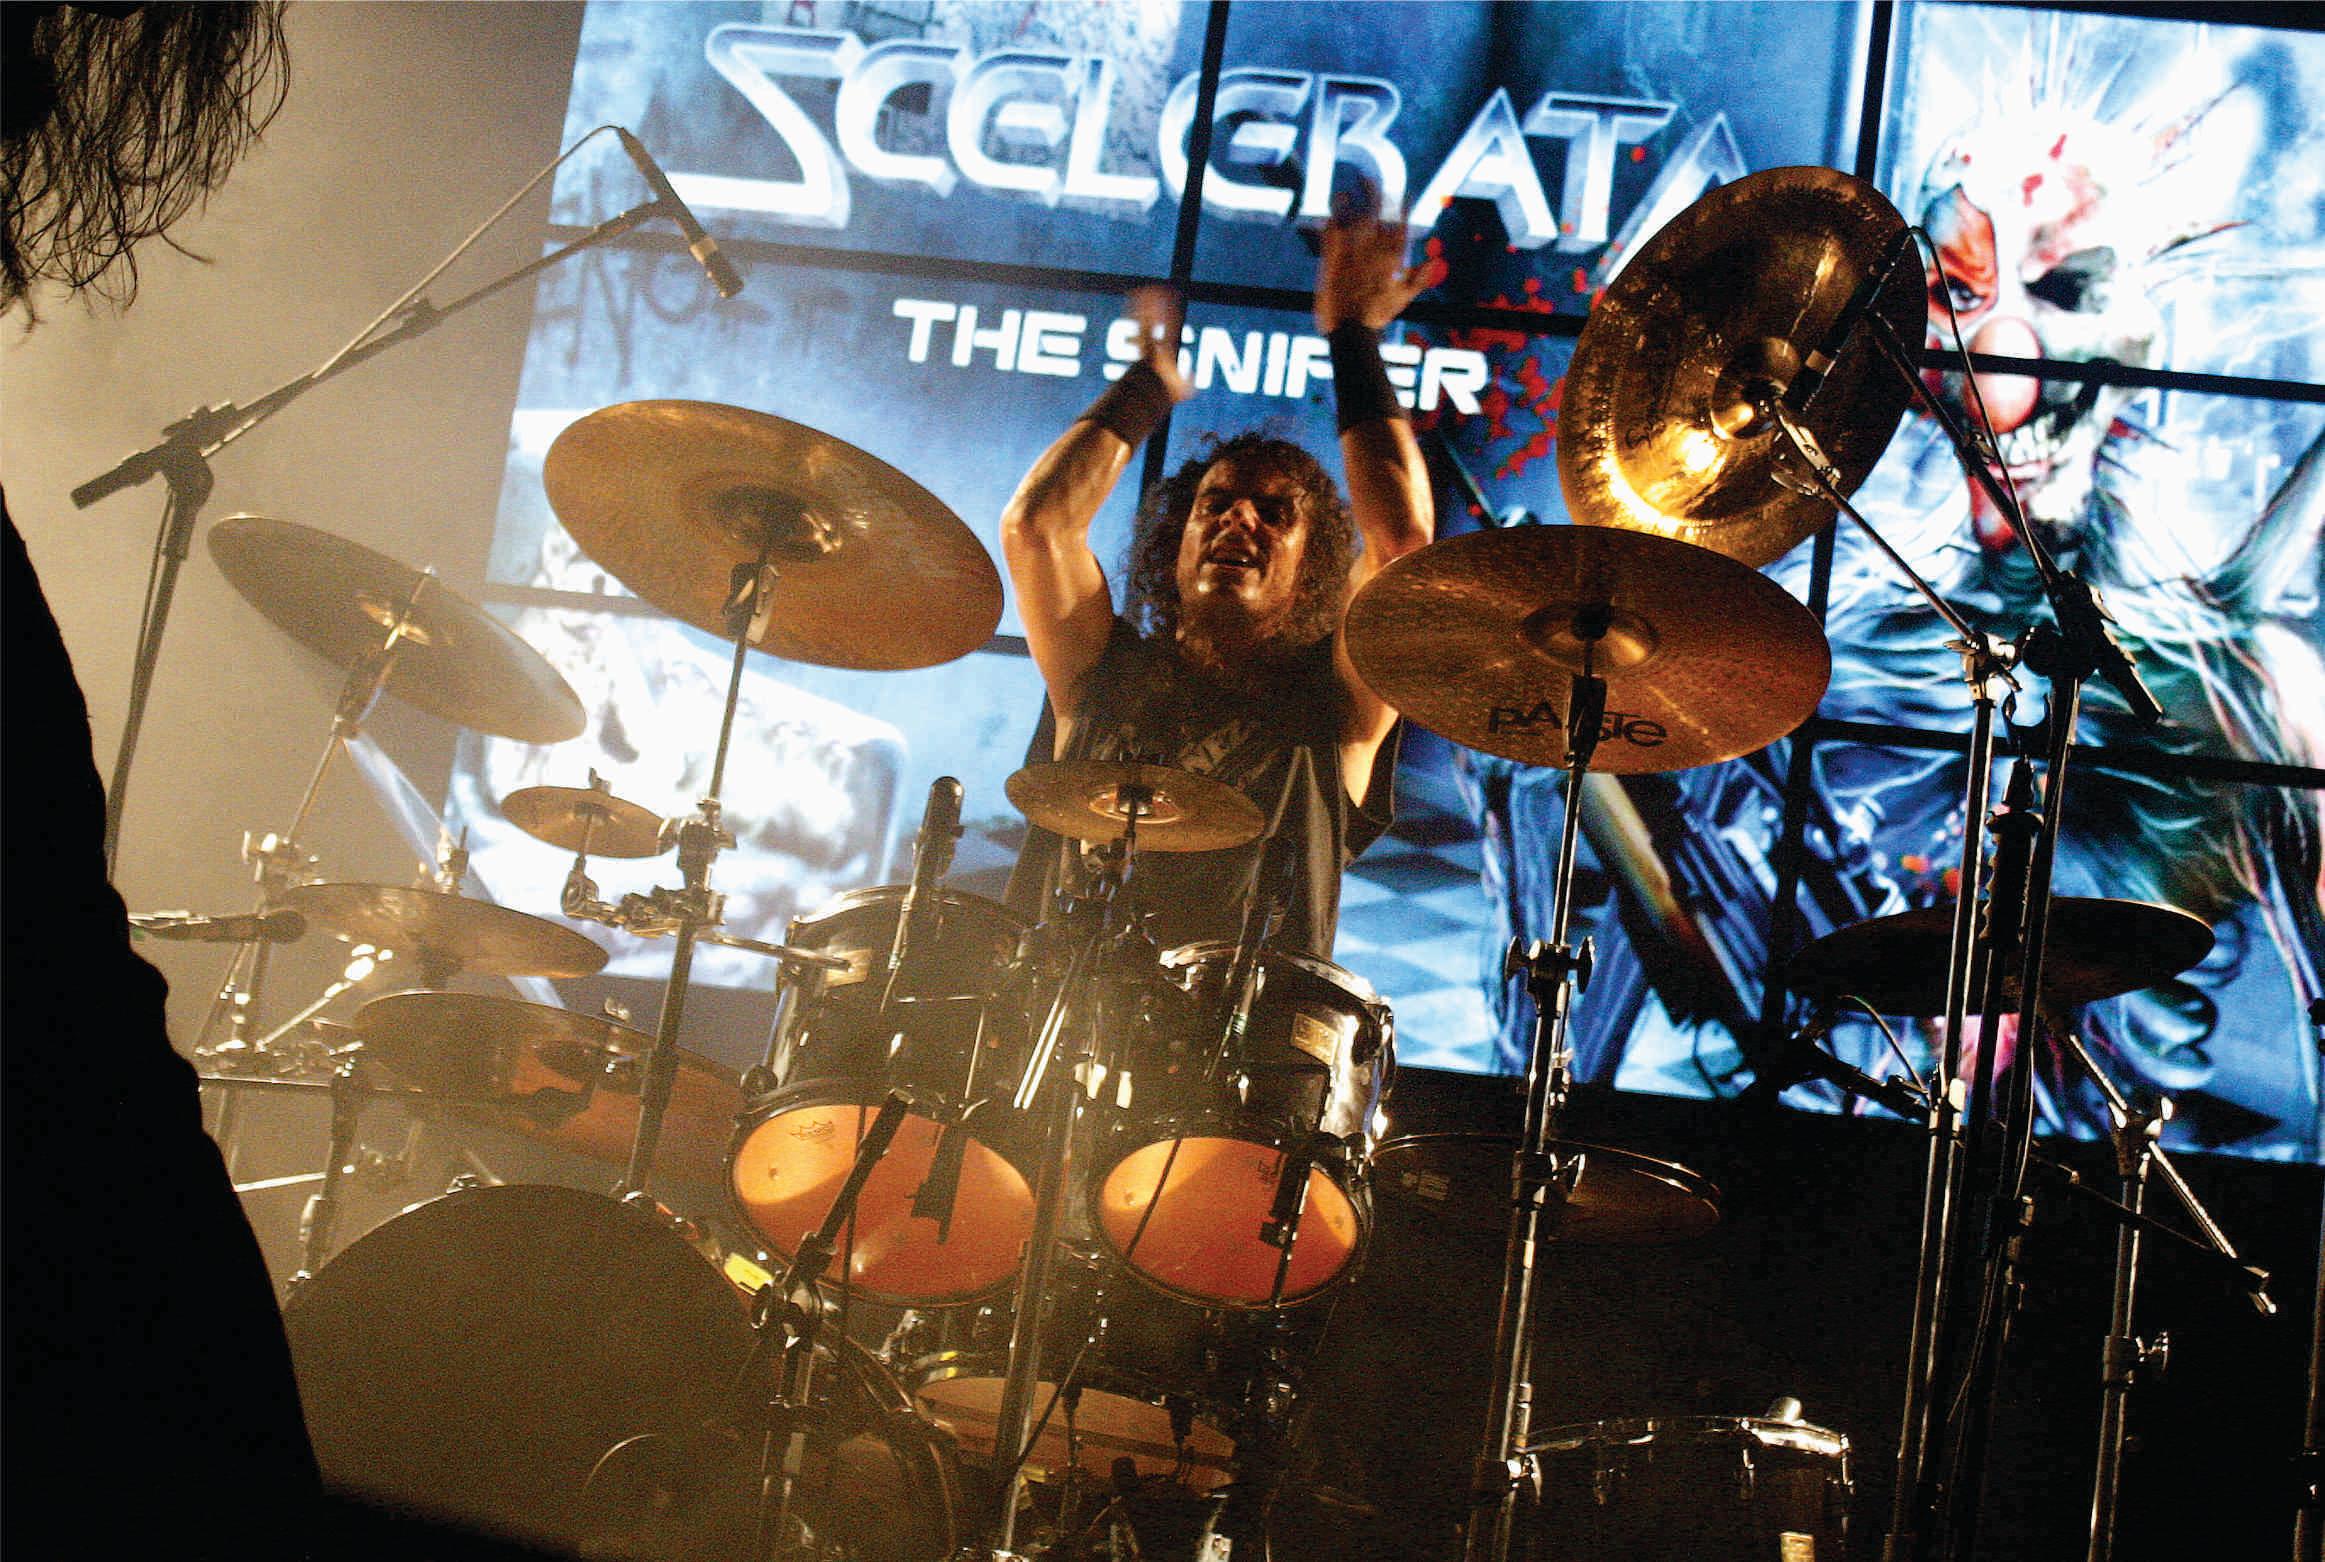 SCELERATA live 2013